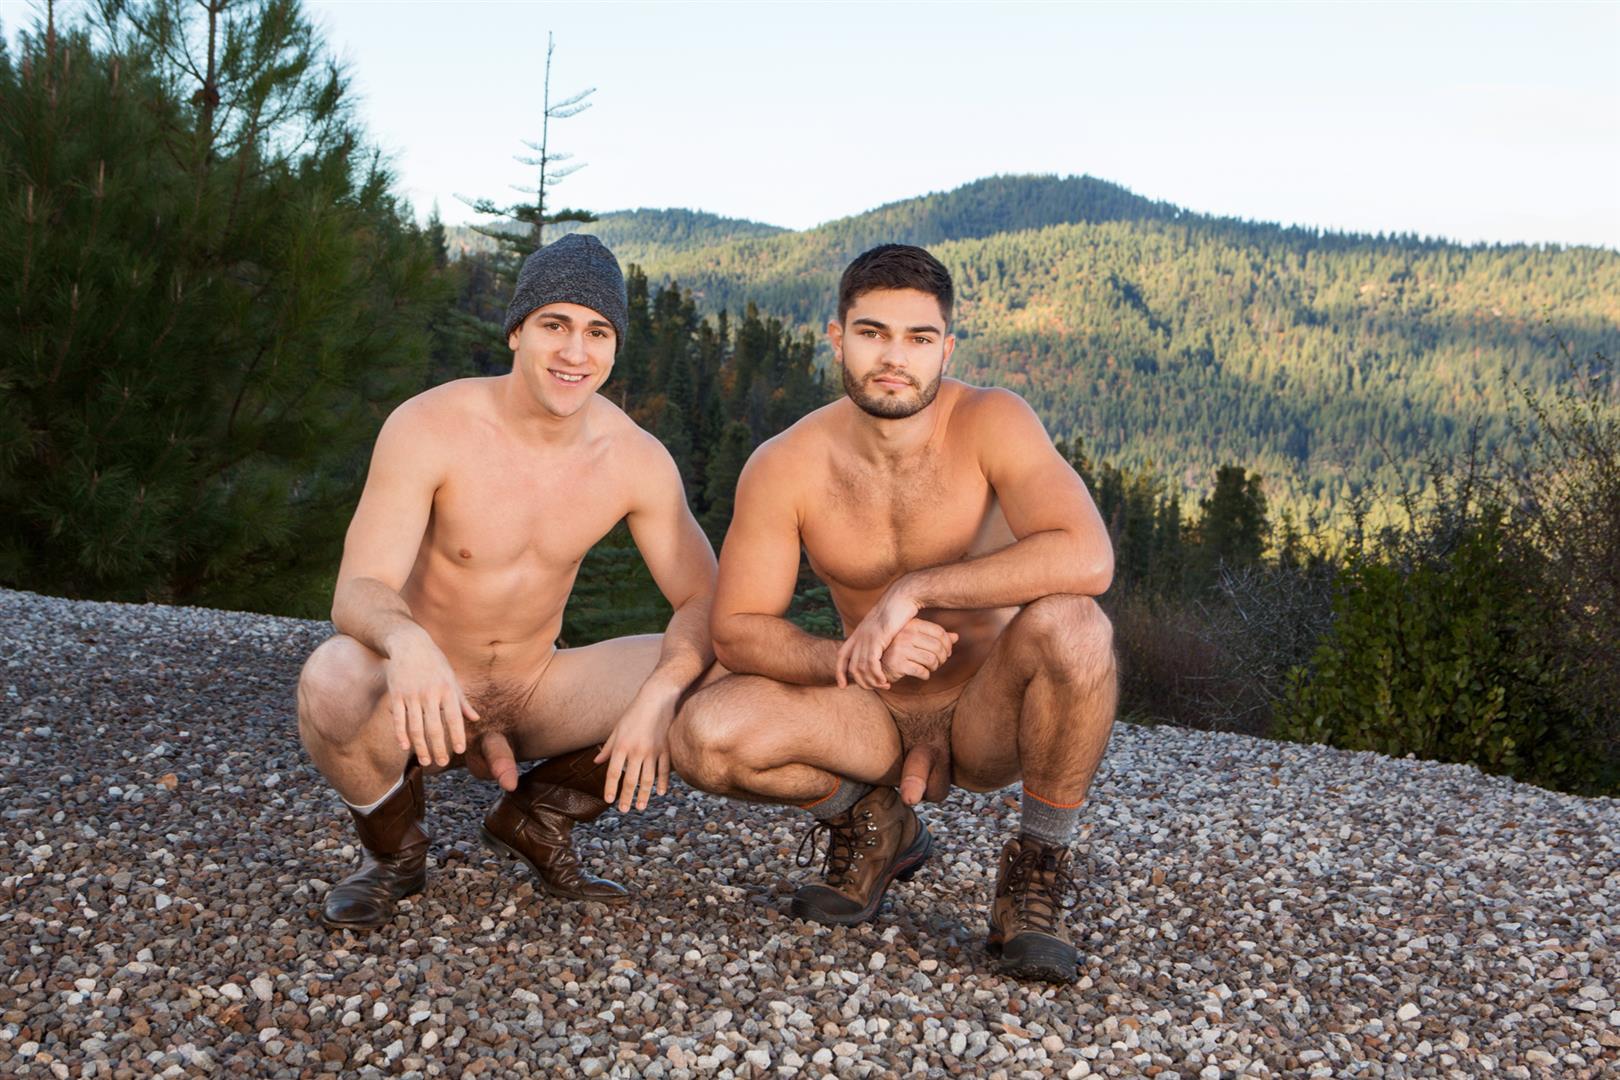 Sean-Cody-Winter-Getaway-Day-3-Big-Dick-Hunks-Fucking-Bareback-Amateur-Gay-Porn-07 Sean Cody Takes The Boys On A 8-Day Bareback Winter Getaway